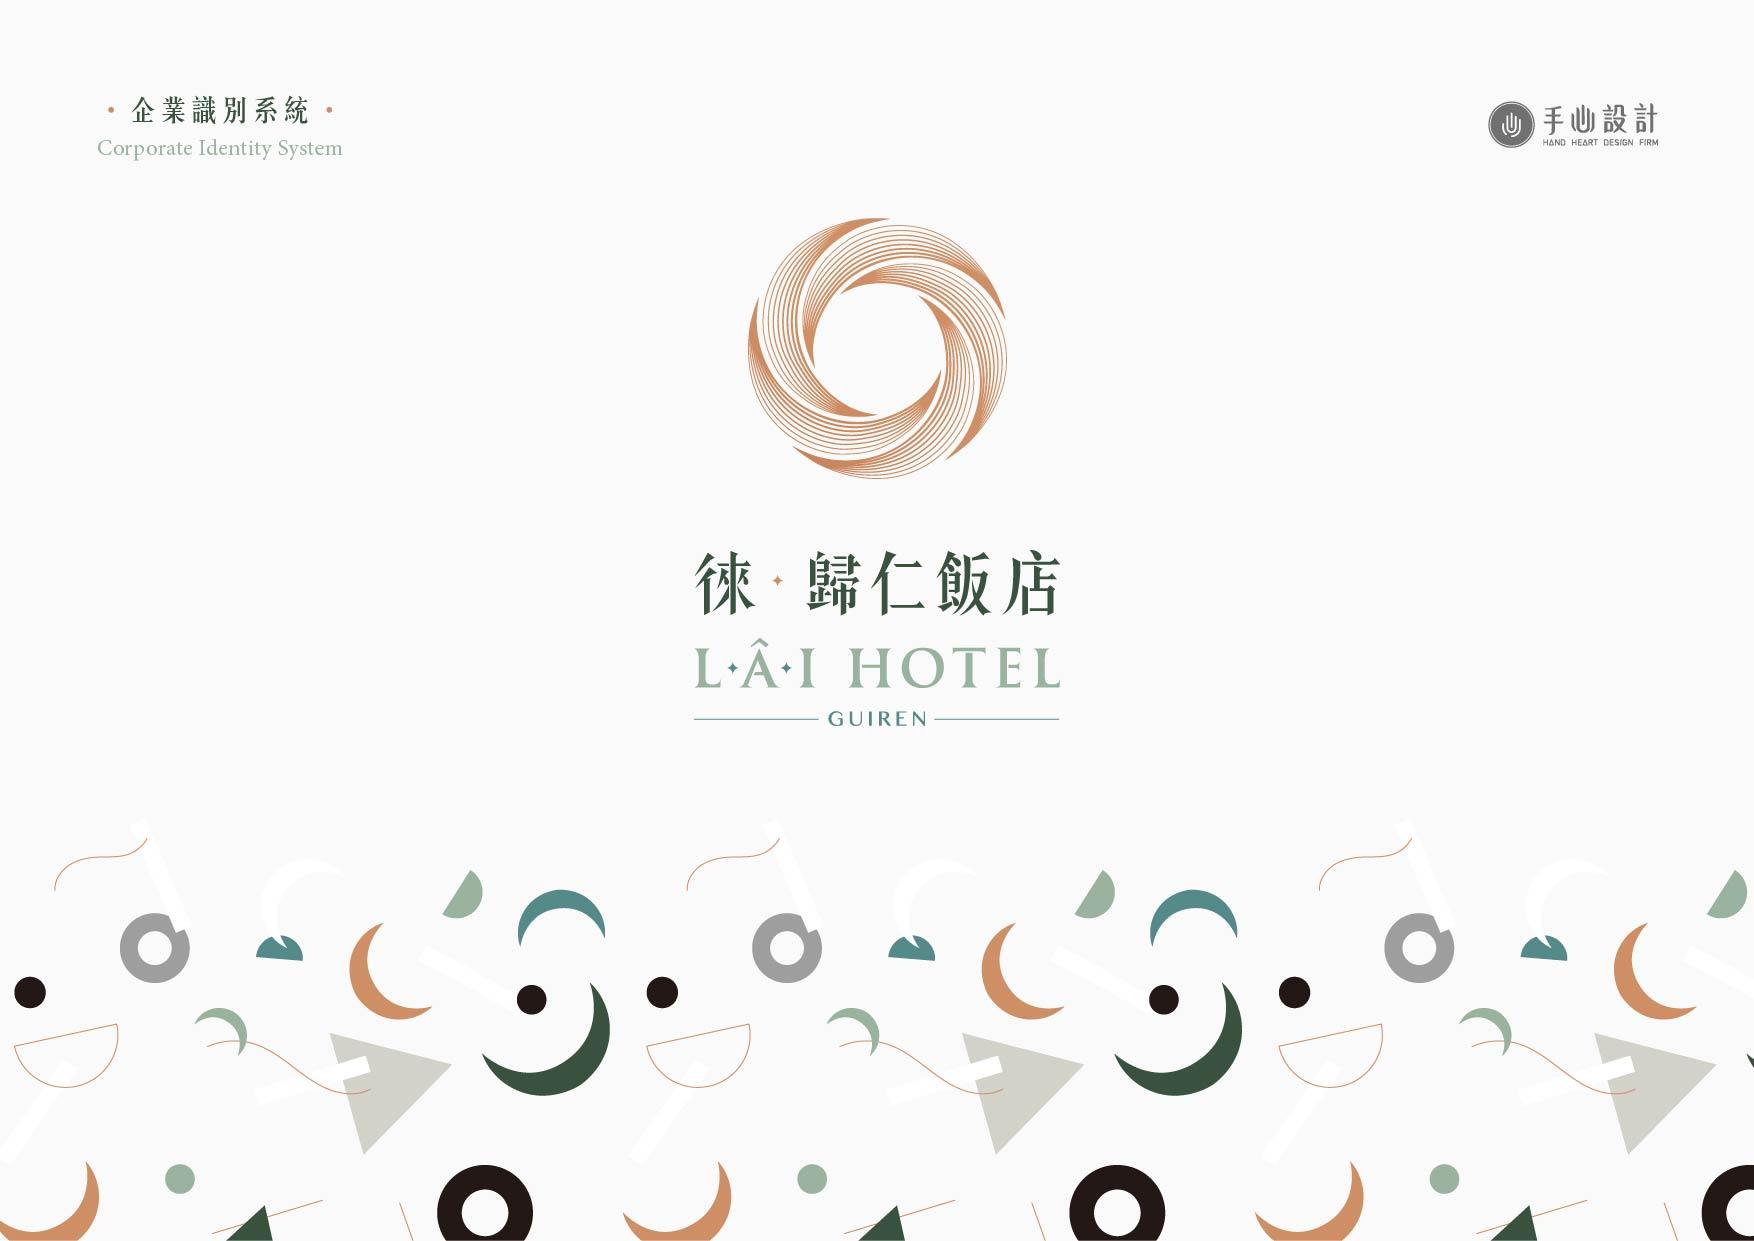 CIS企業識別系統設計_徠歸仁飯店_品牌識別設計_台南_設計_手心設計_(01)